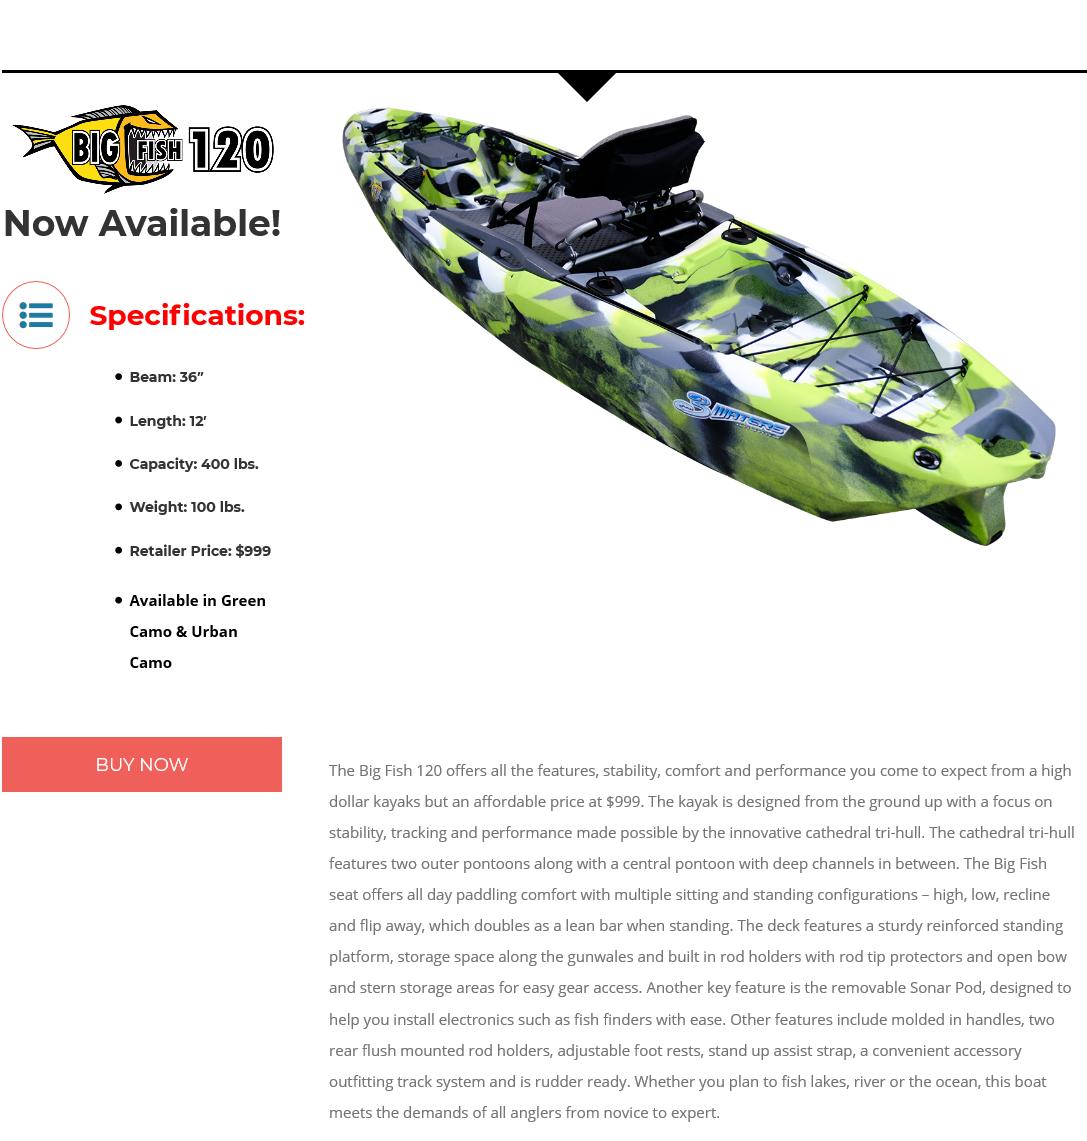 3 Waters Kayaks Big Fish 120 Urban Camo **** Store pickup only No Shipping ****